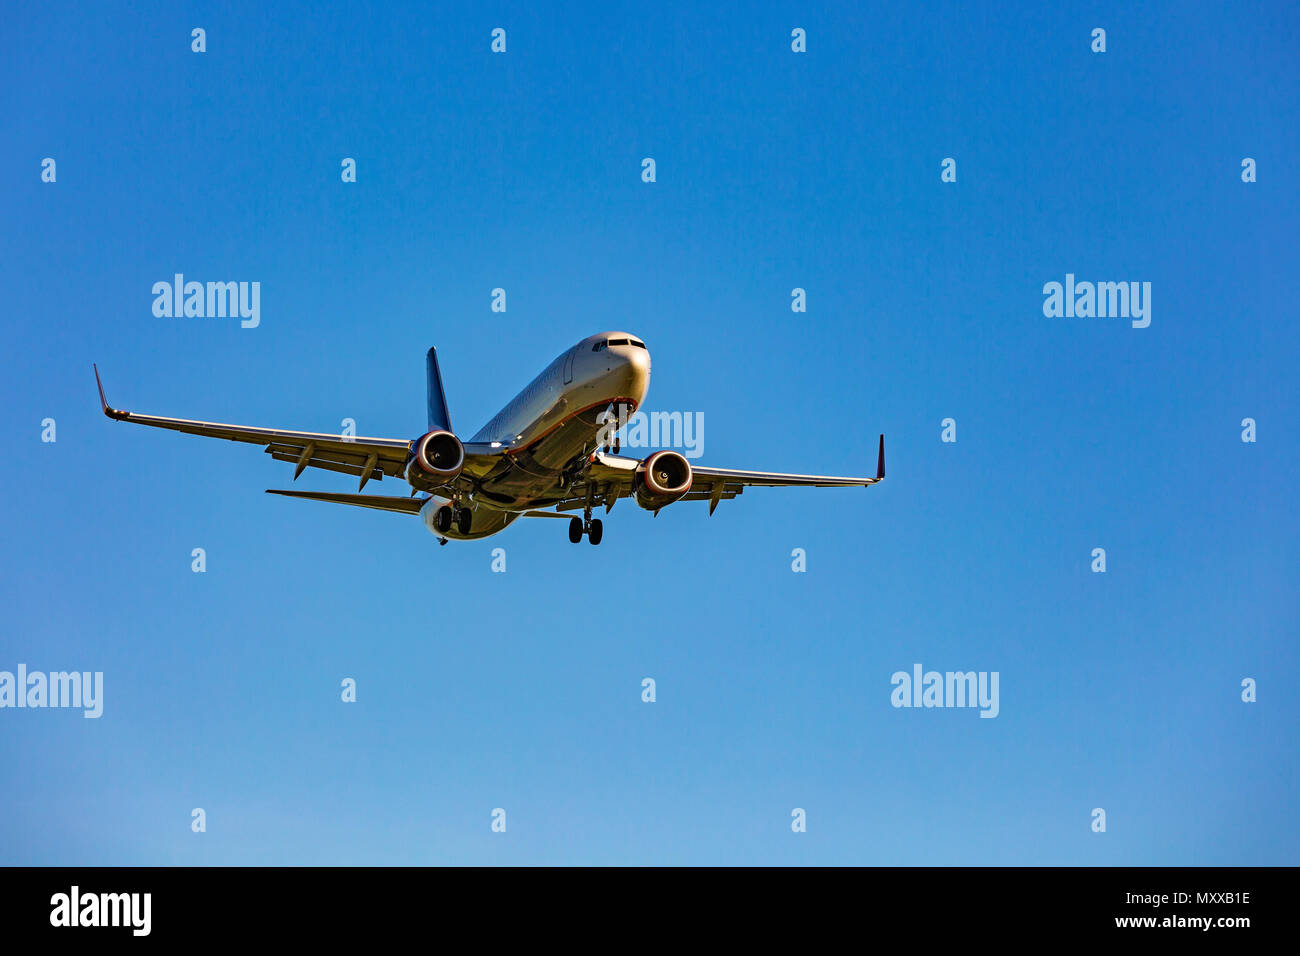 Large passenger plane flying in the blue sky Stock Photo